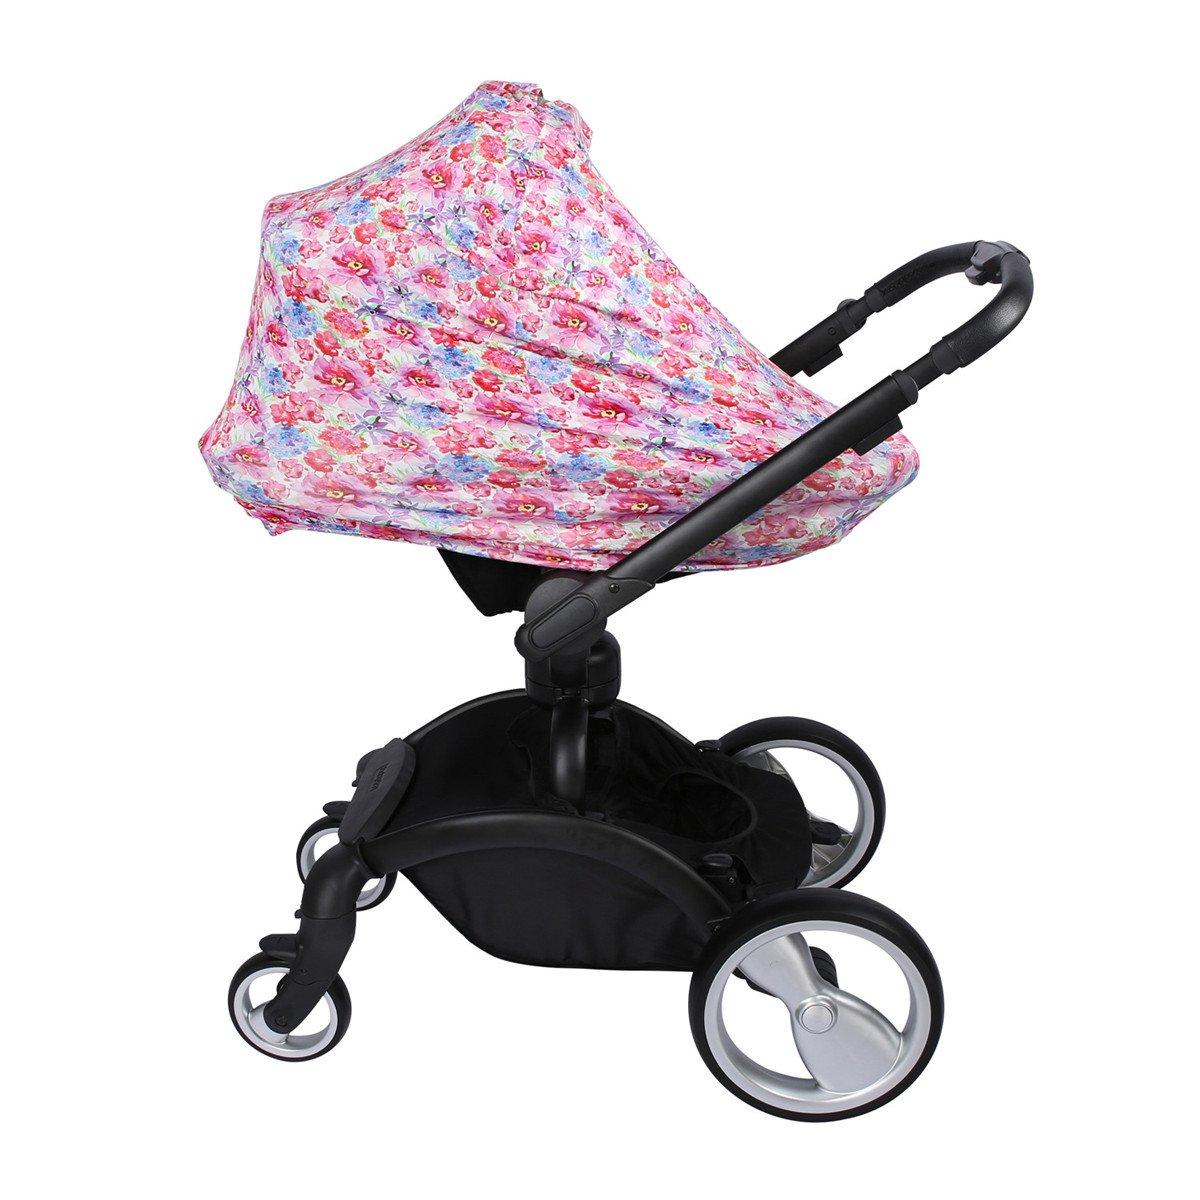 Storeofbaby Baby Car Seat Covers for Girls Flower Print Breastfeeding Nursing Scarf